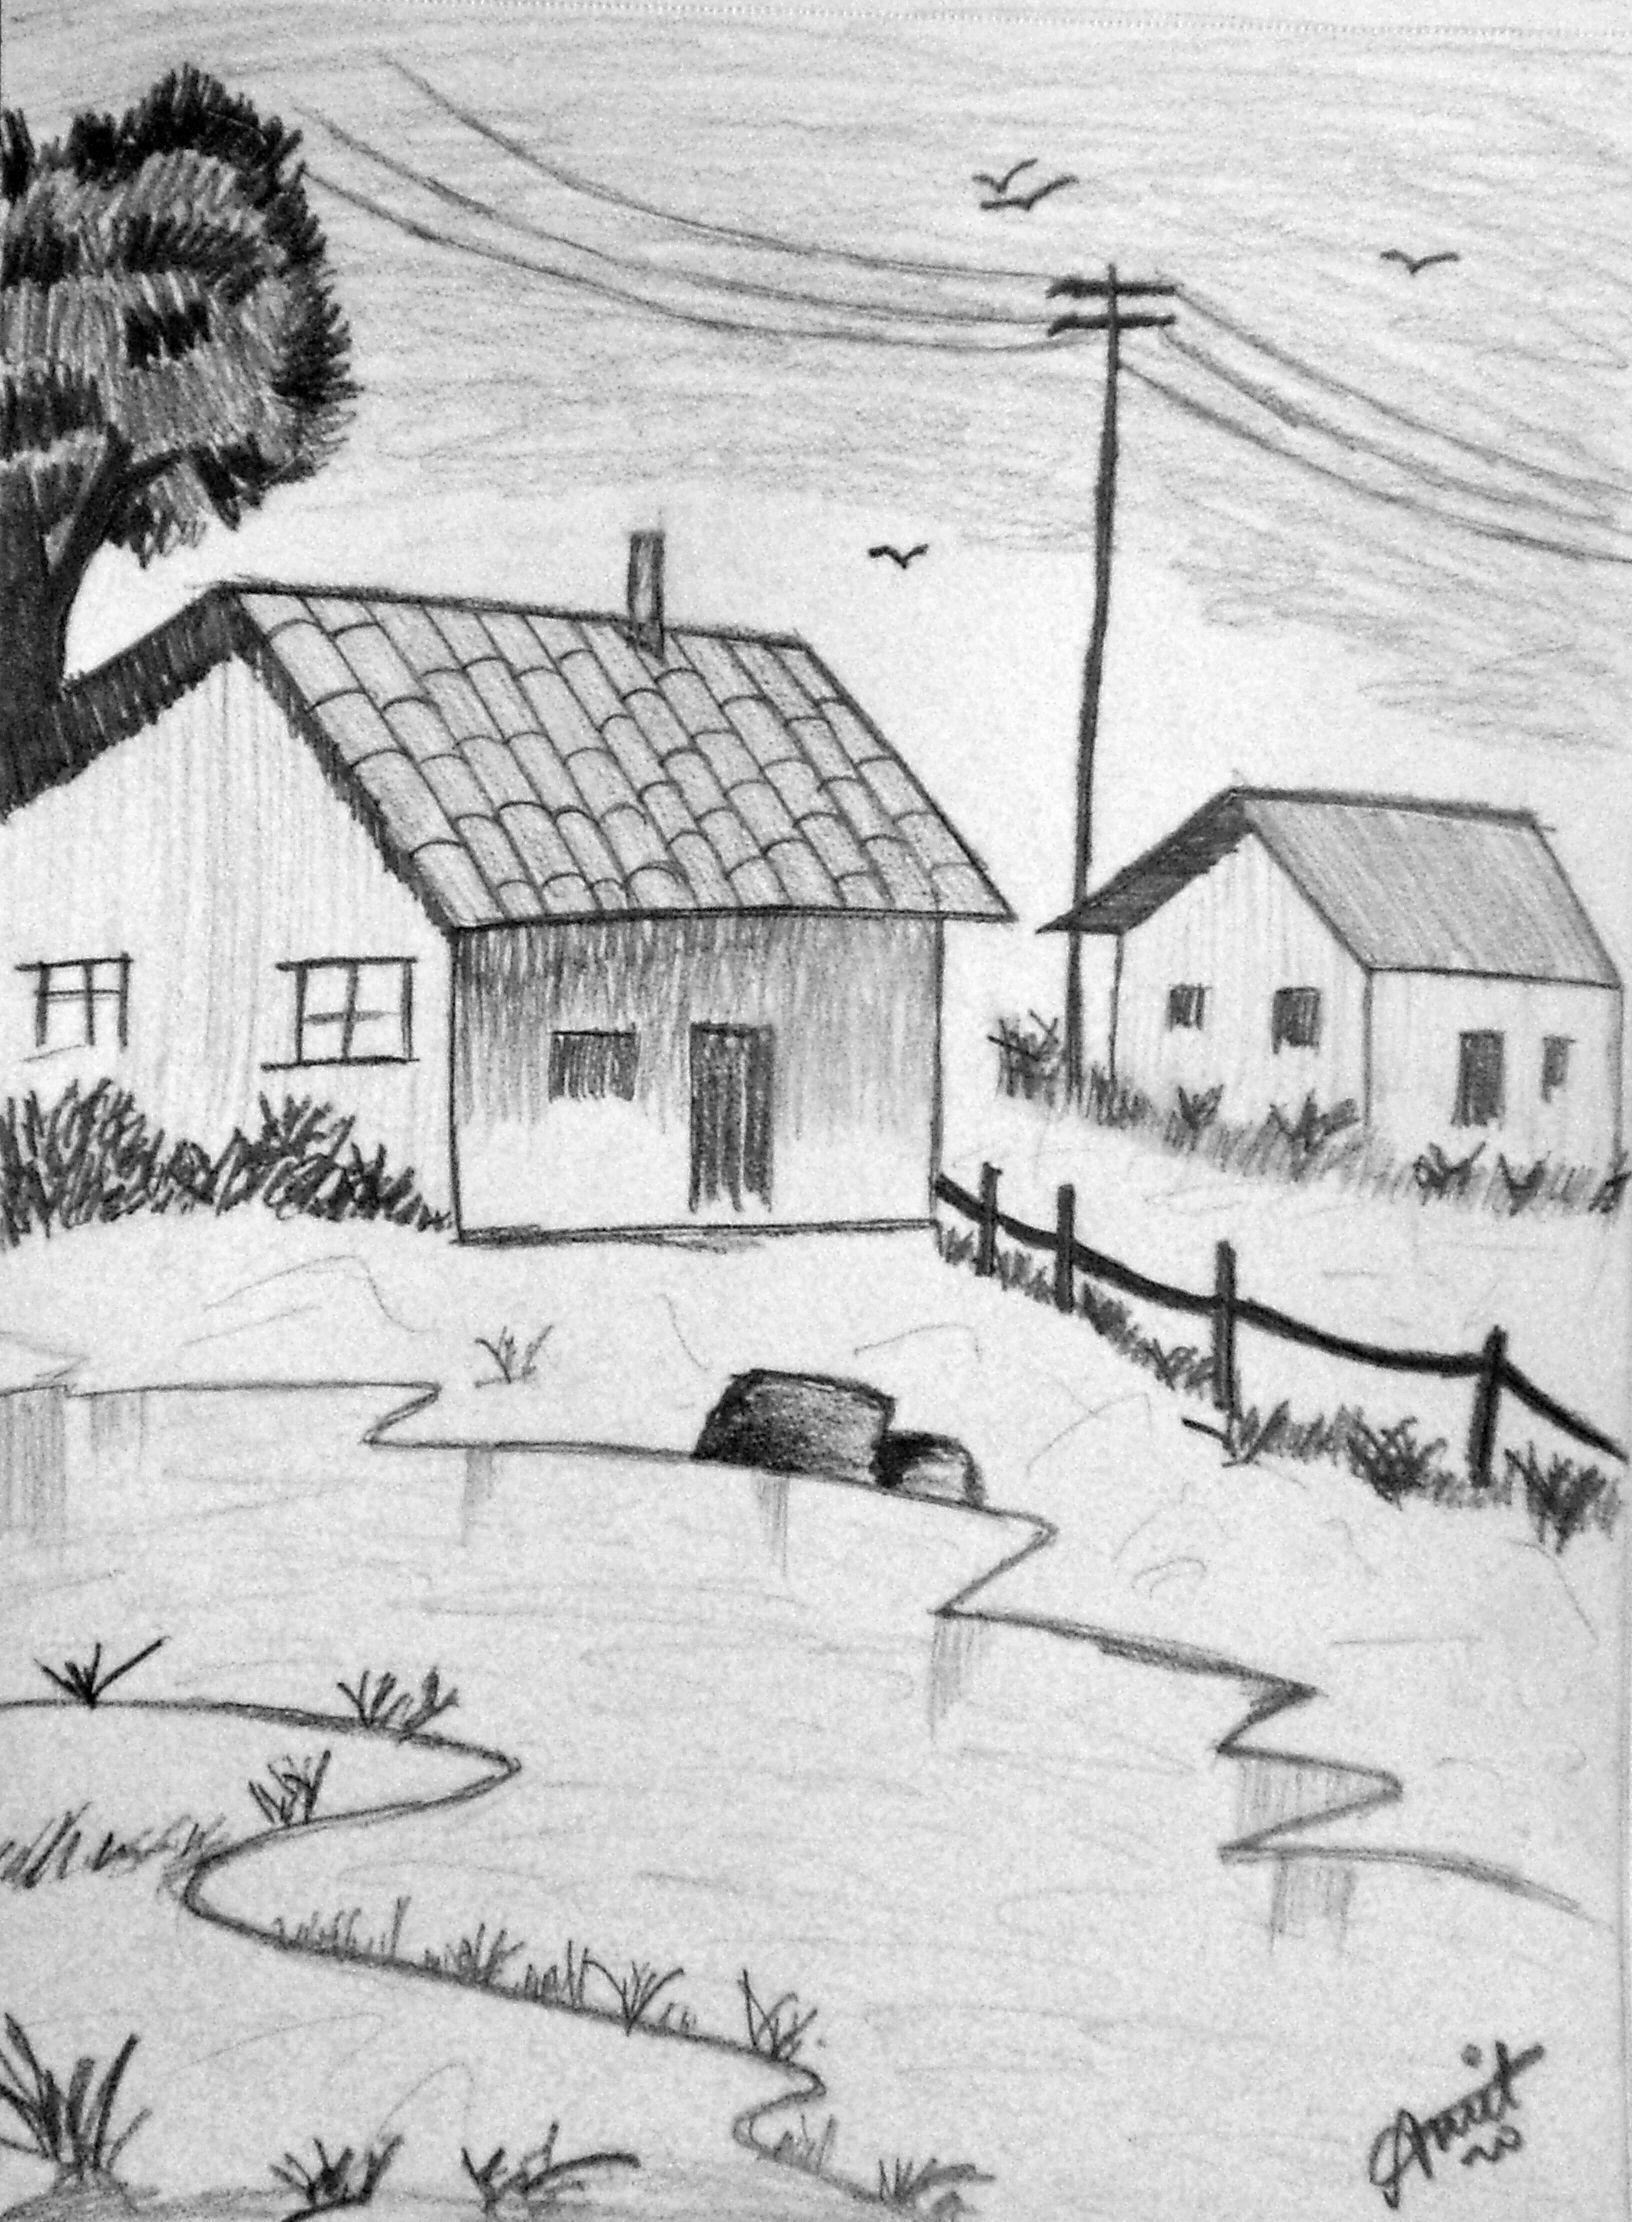 Image Result For Landscape Drawings Easy Art Pinterest Pencil Landscape Pencil Drawings Landscape Drawing Easy Pencil Drawings Of Nature